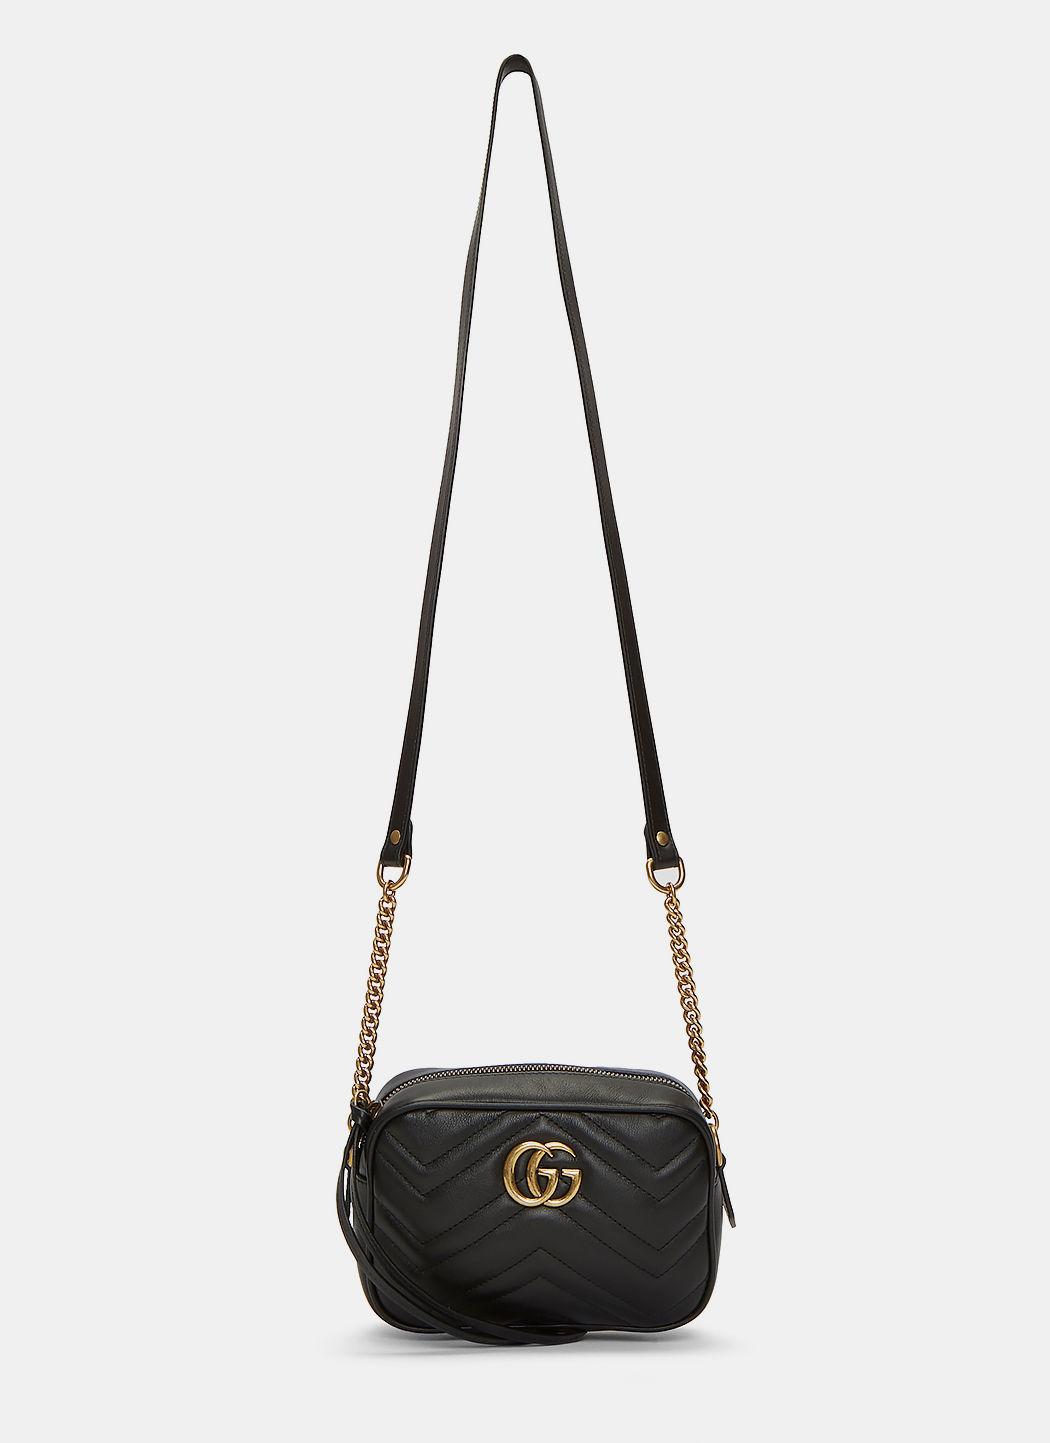 335ec078ac6f66 Gucci Women'S Gg Marmont MatelassÉ Mini Bag In Black | ModeSens